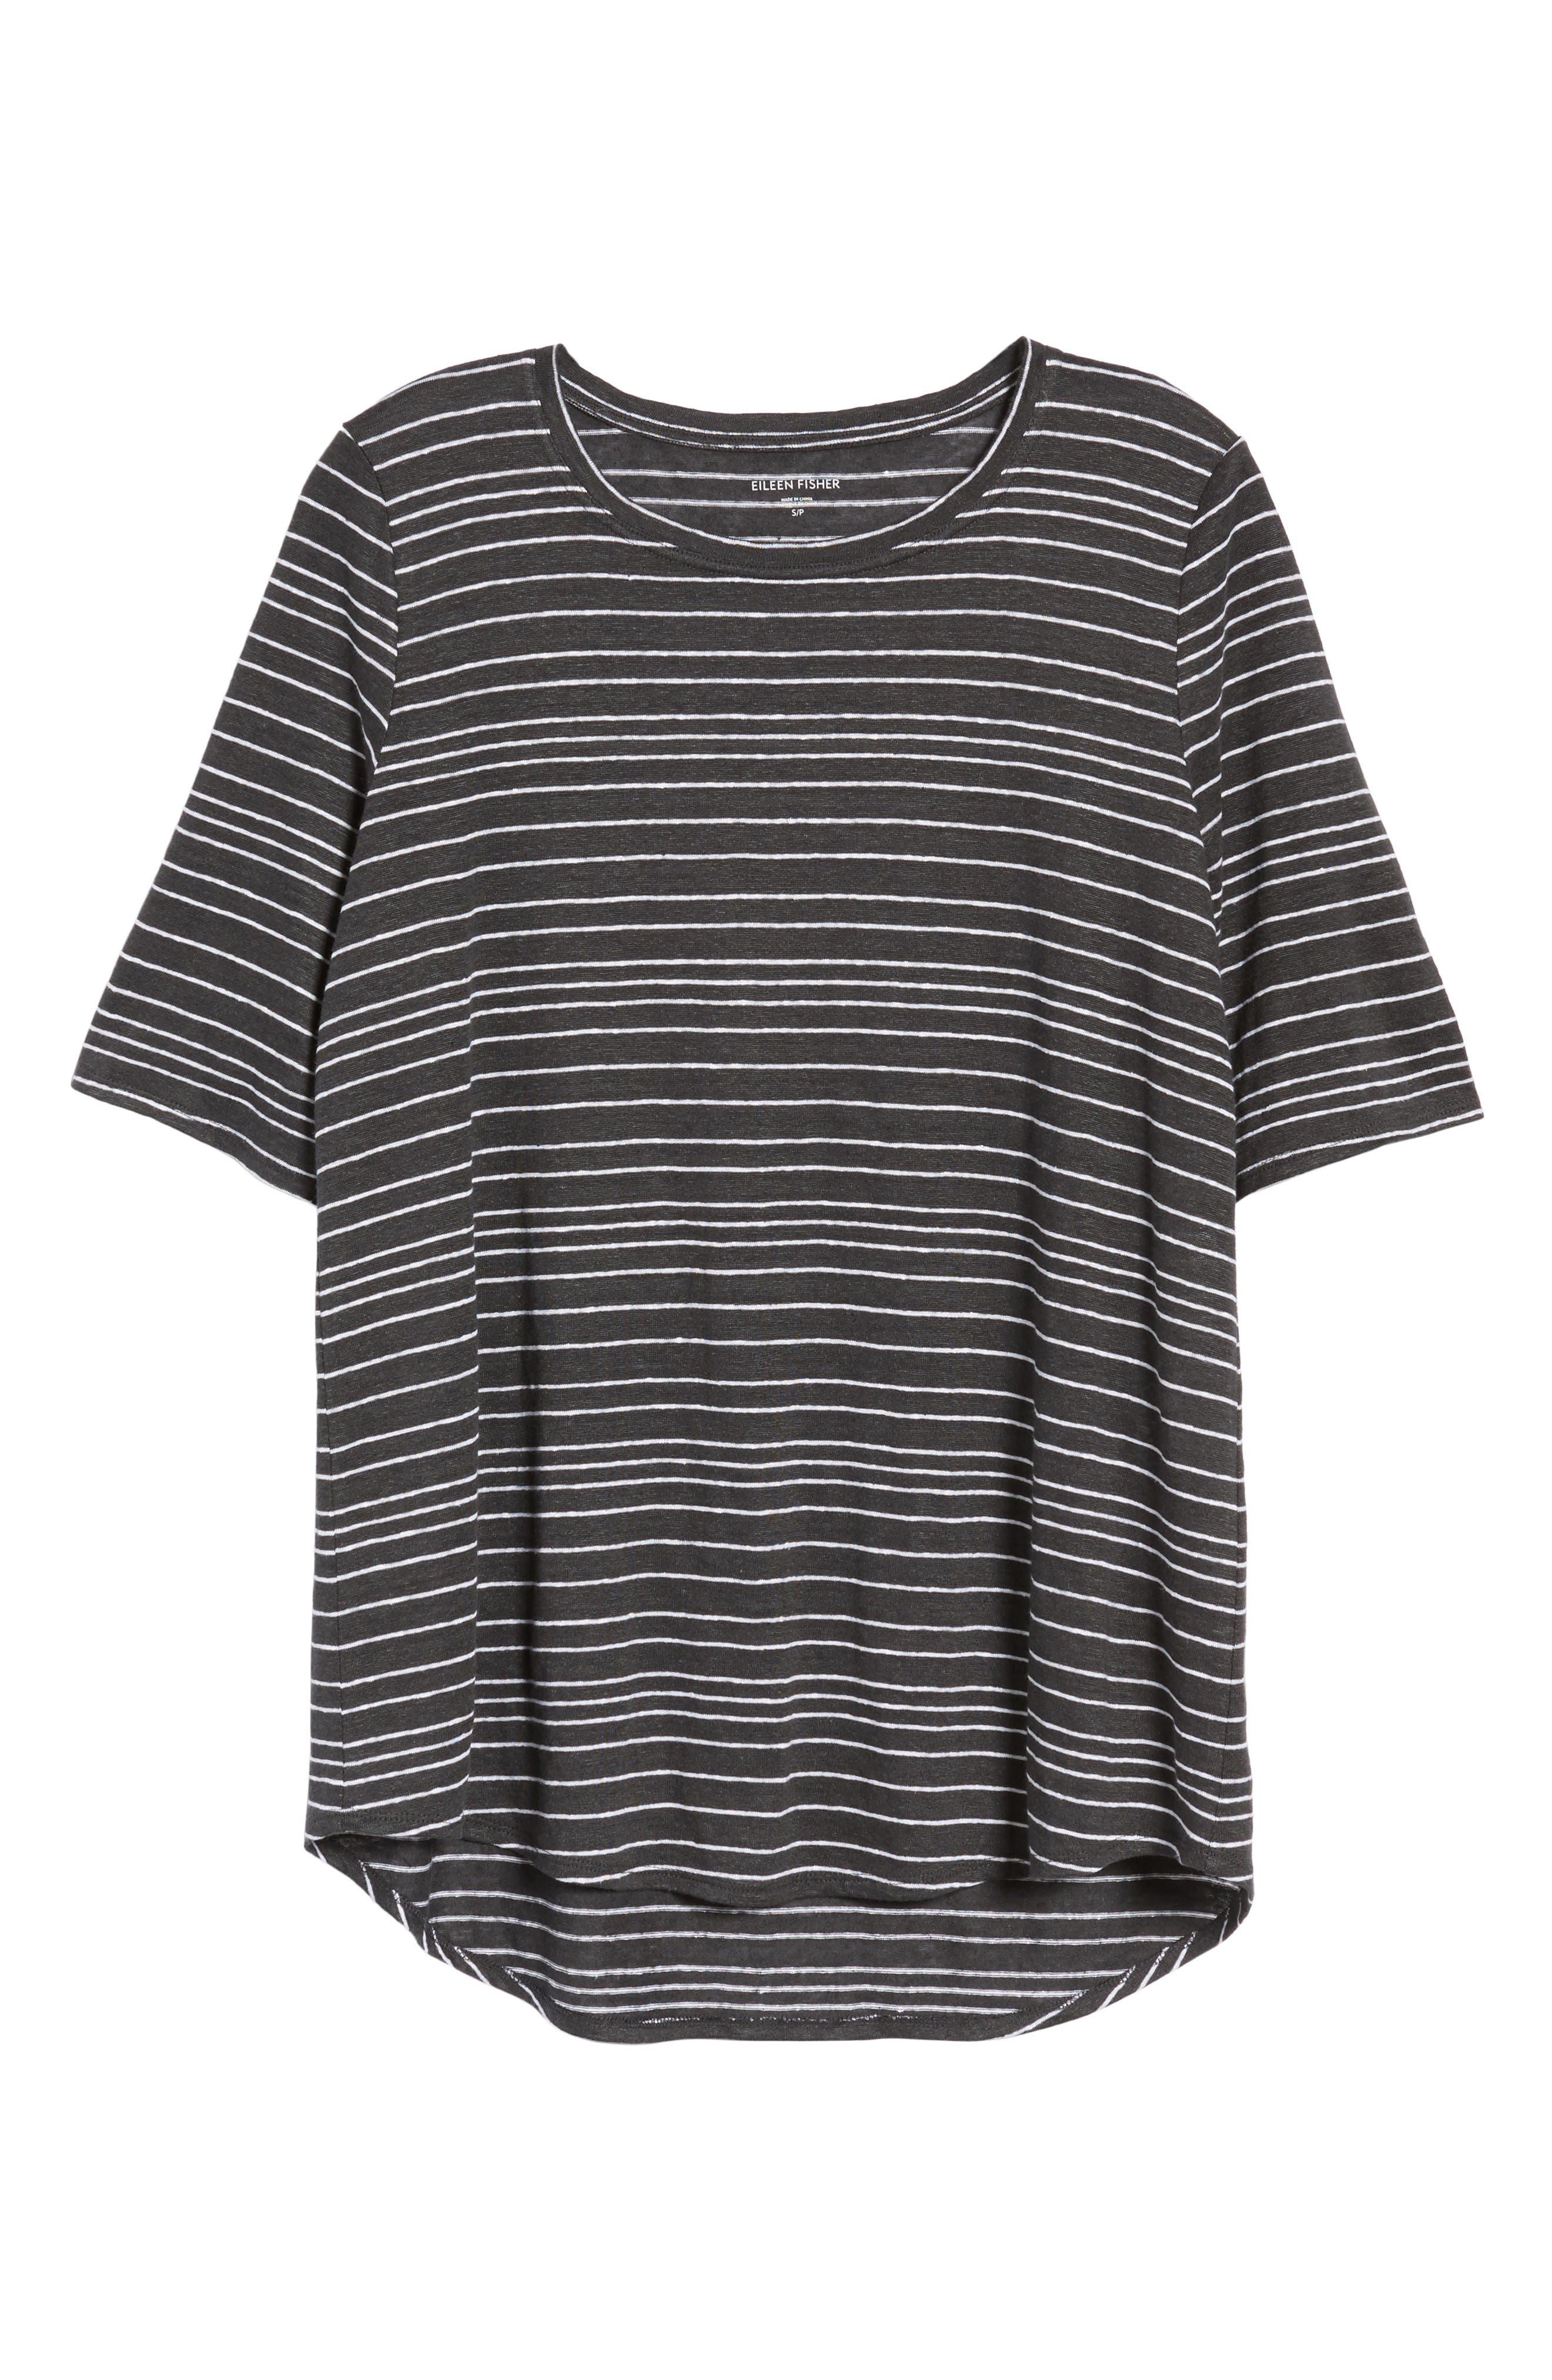 Stripe Organic Linen Top,                             Alternate thumbnail 7, color,                             Graphite